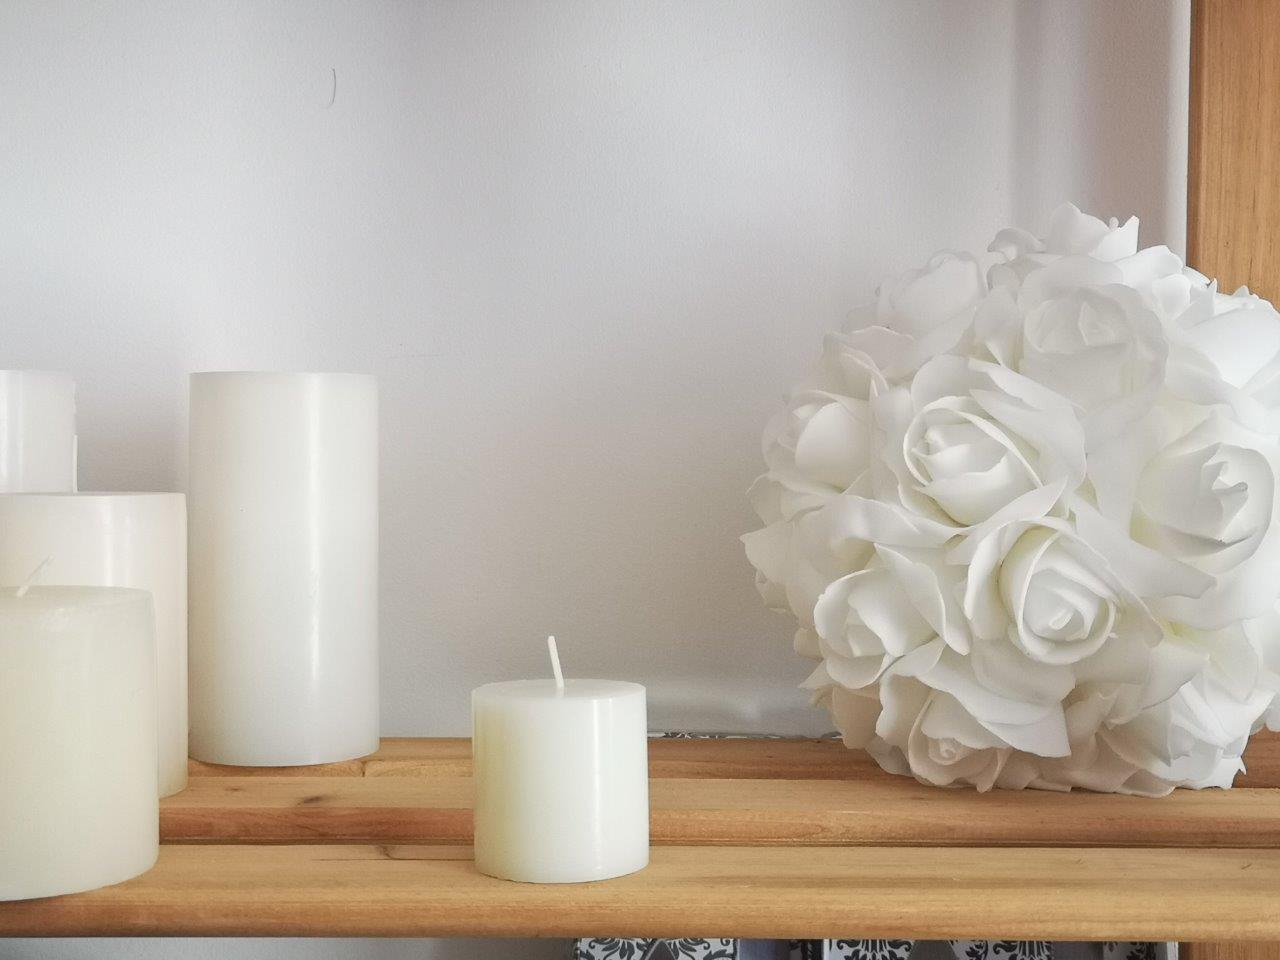 Ivory Pillar Candle 5cm x 5cm Ivory Pillar Candle